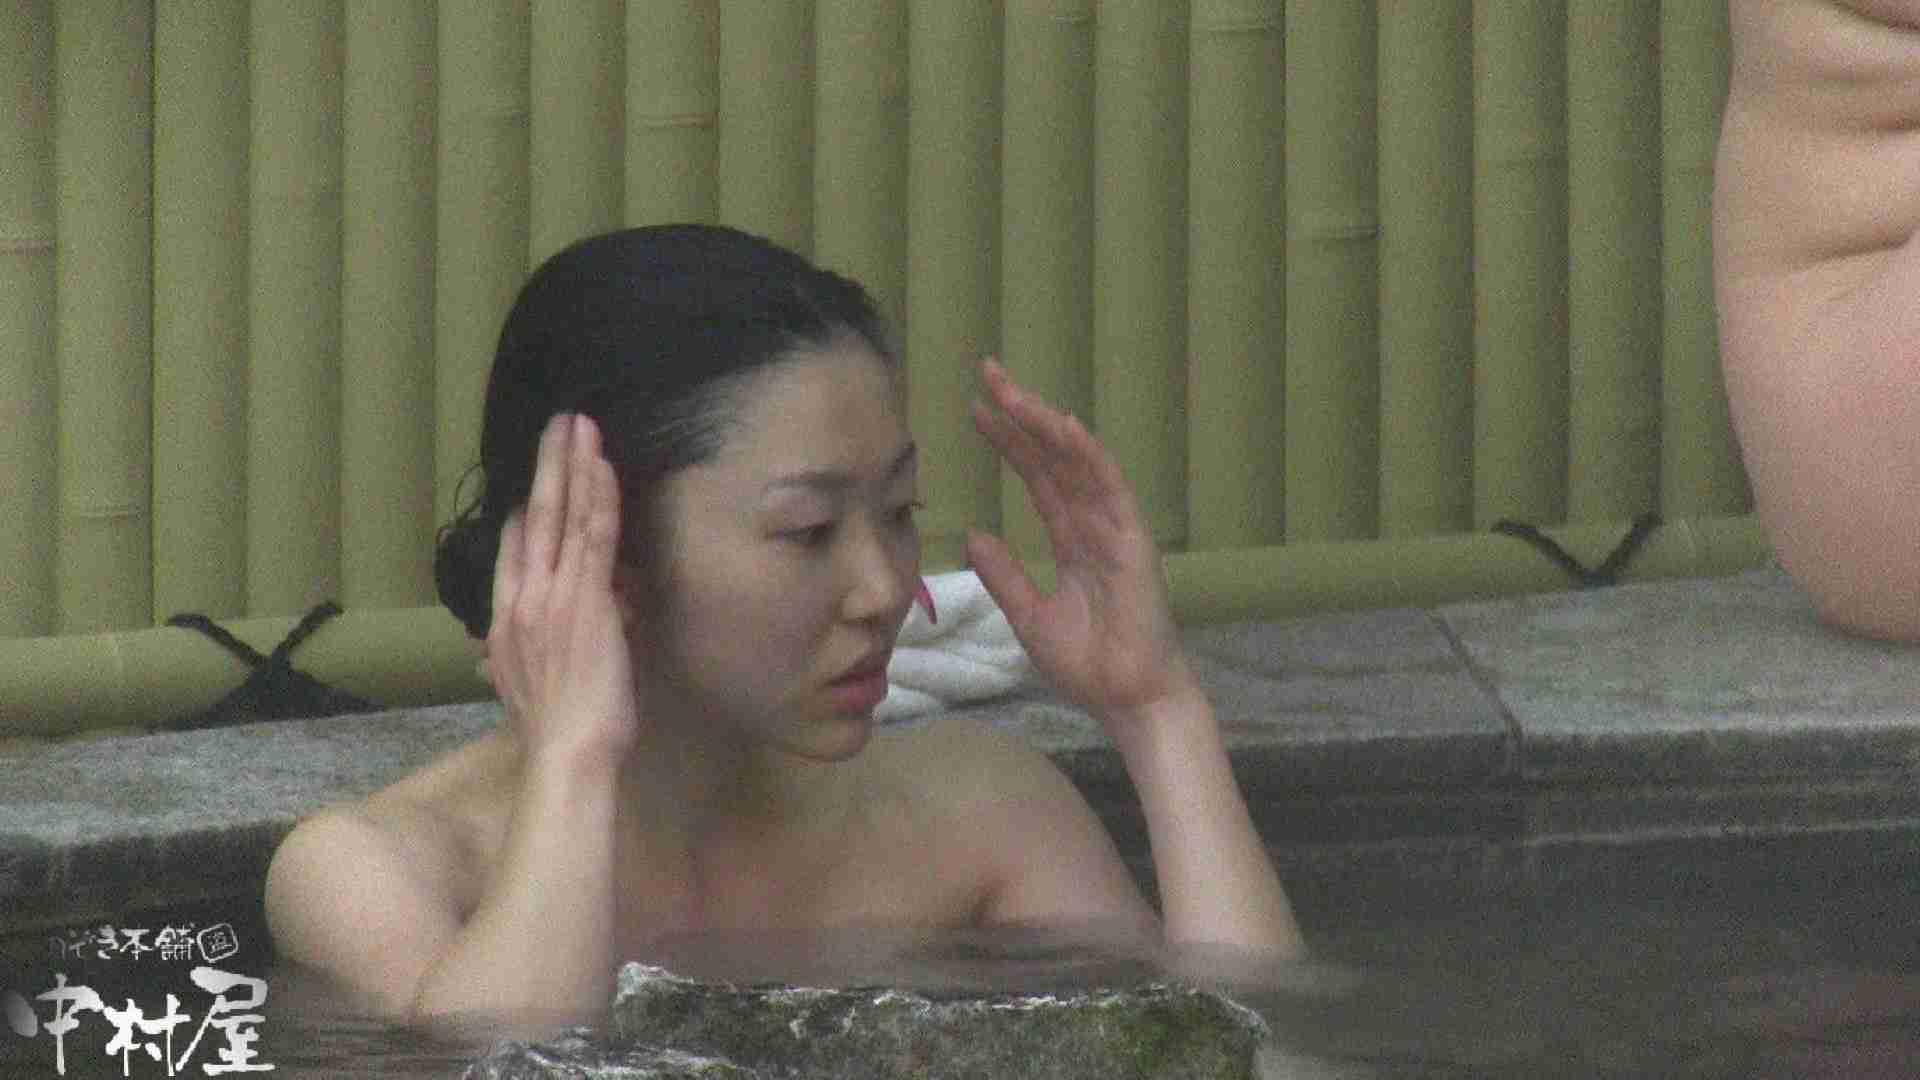 Aquaな露天風呂Vol.917 盗撮シリーズ   露天風呂編  108PIX 53